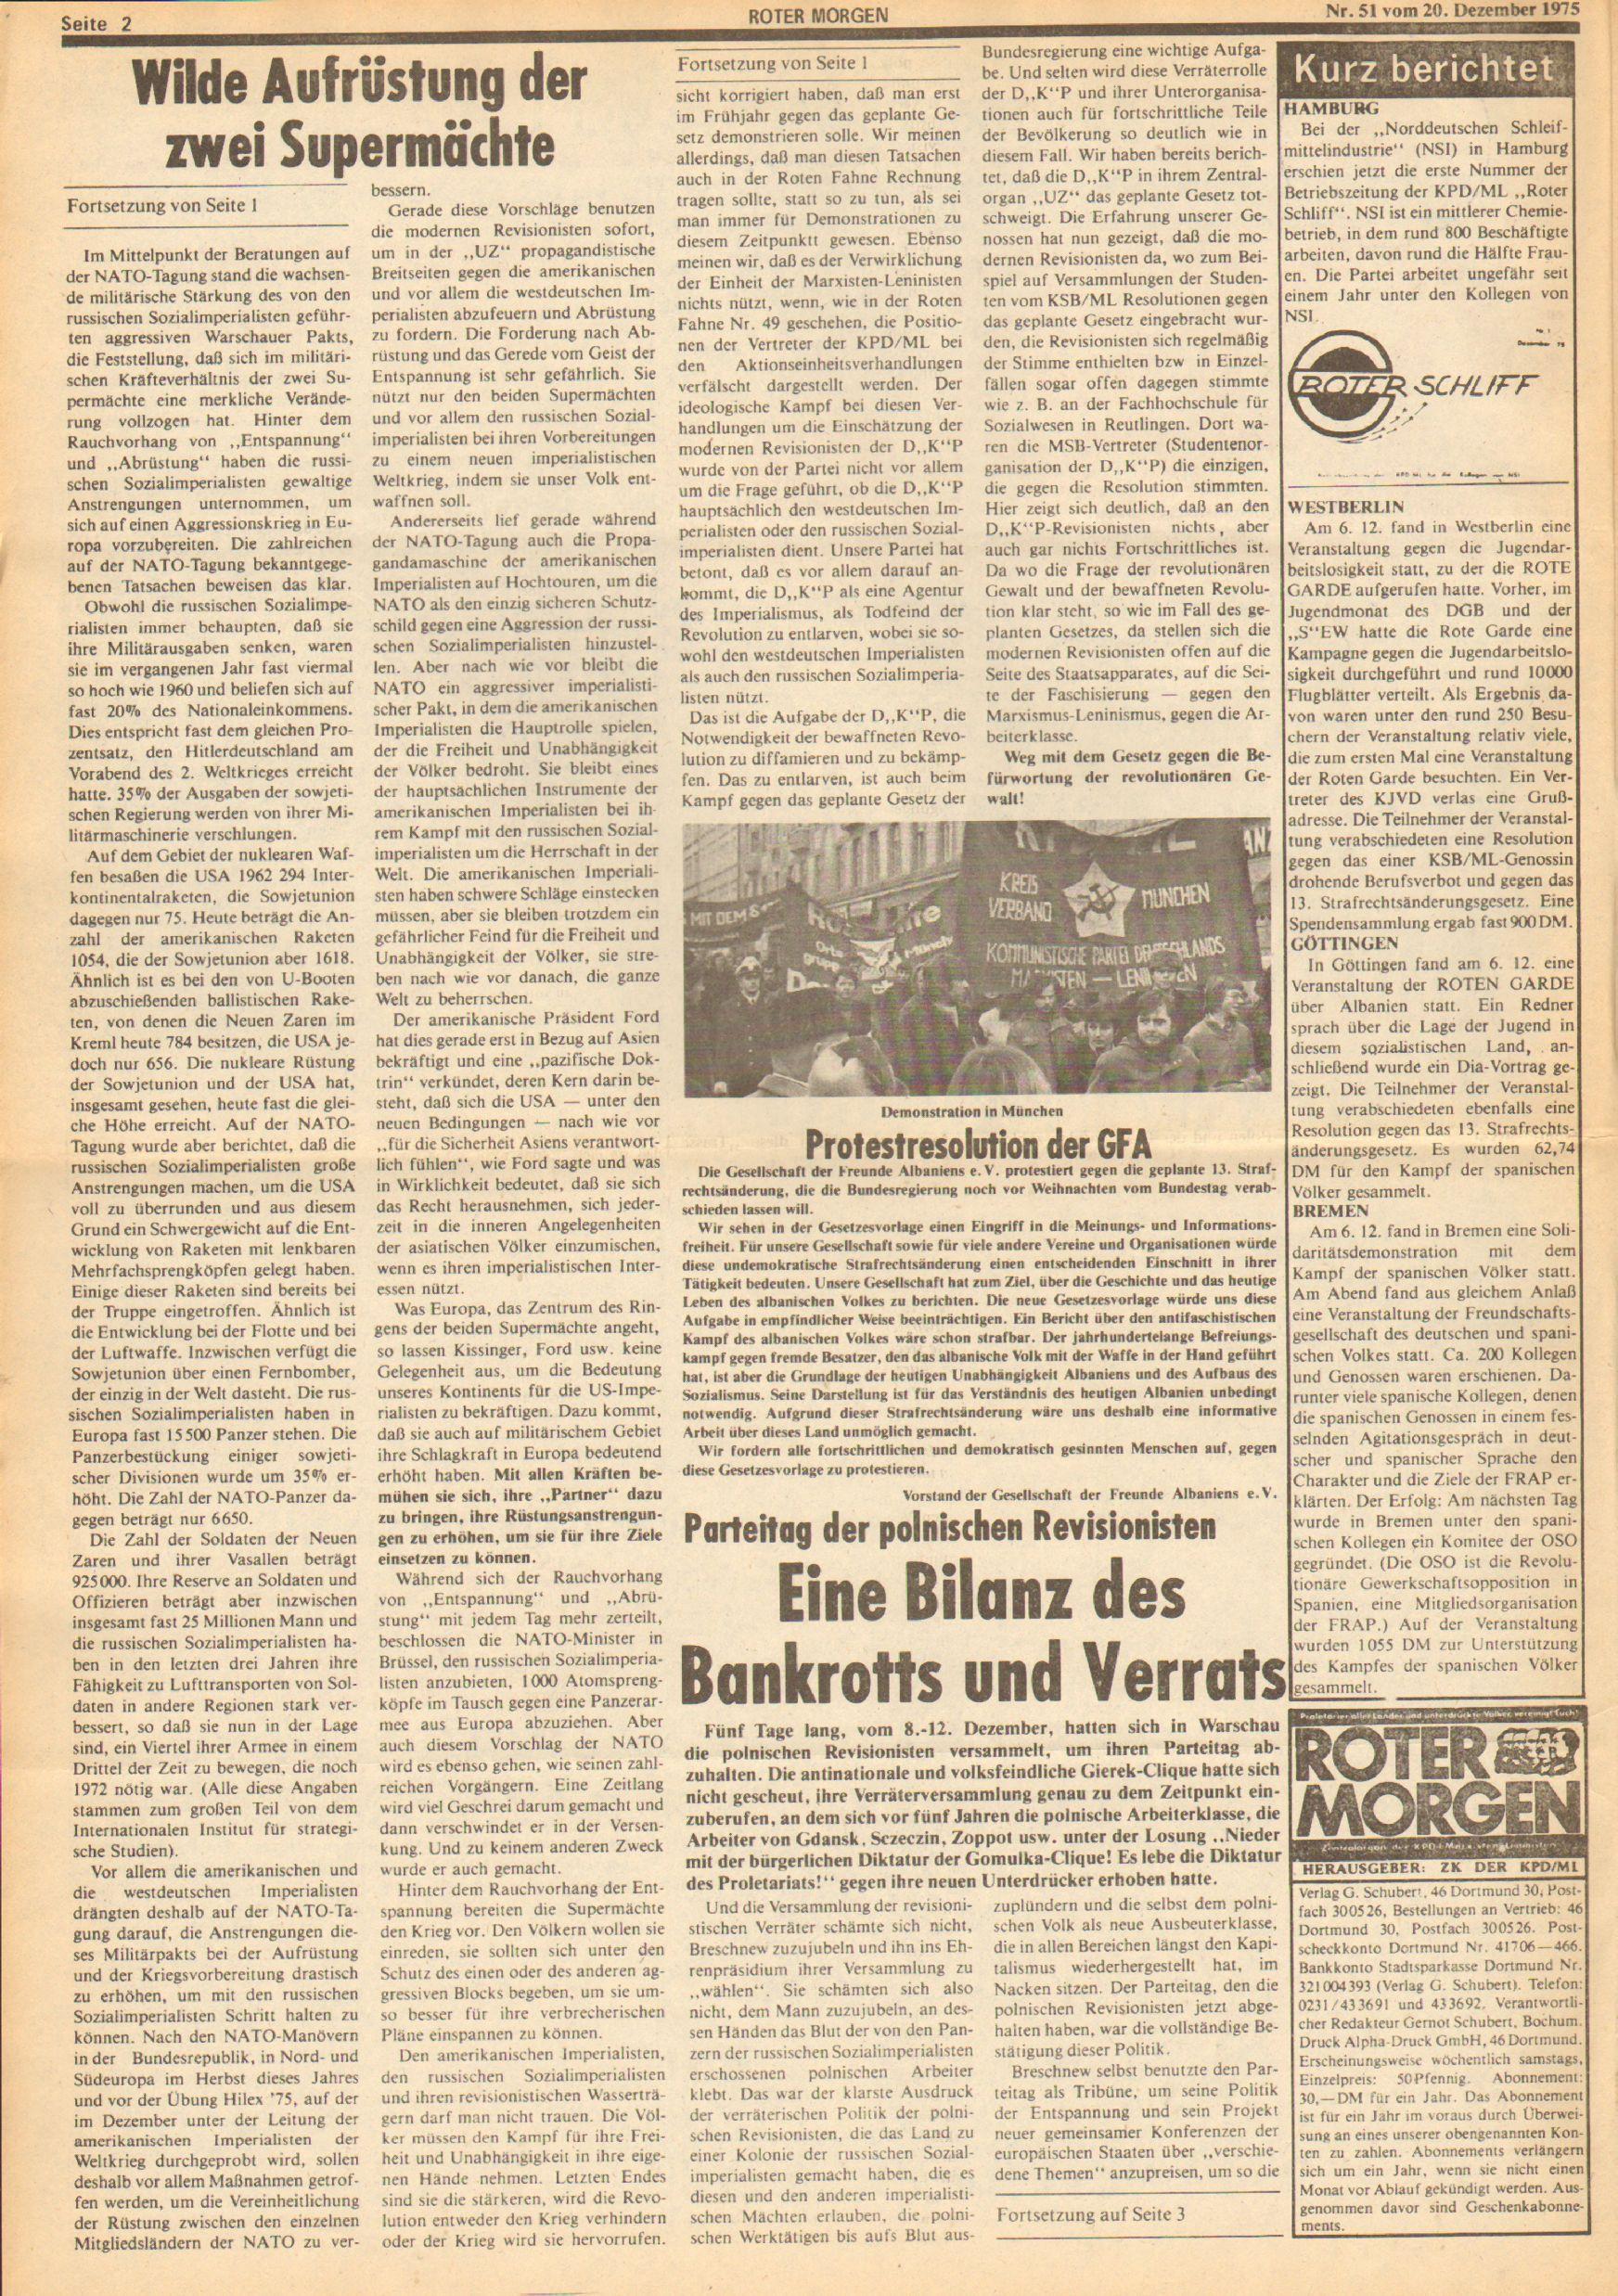 Roter Morgen, 9. Jg., 20. Dezember 1975, Nr. 51, Seite 2